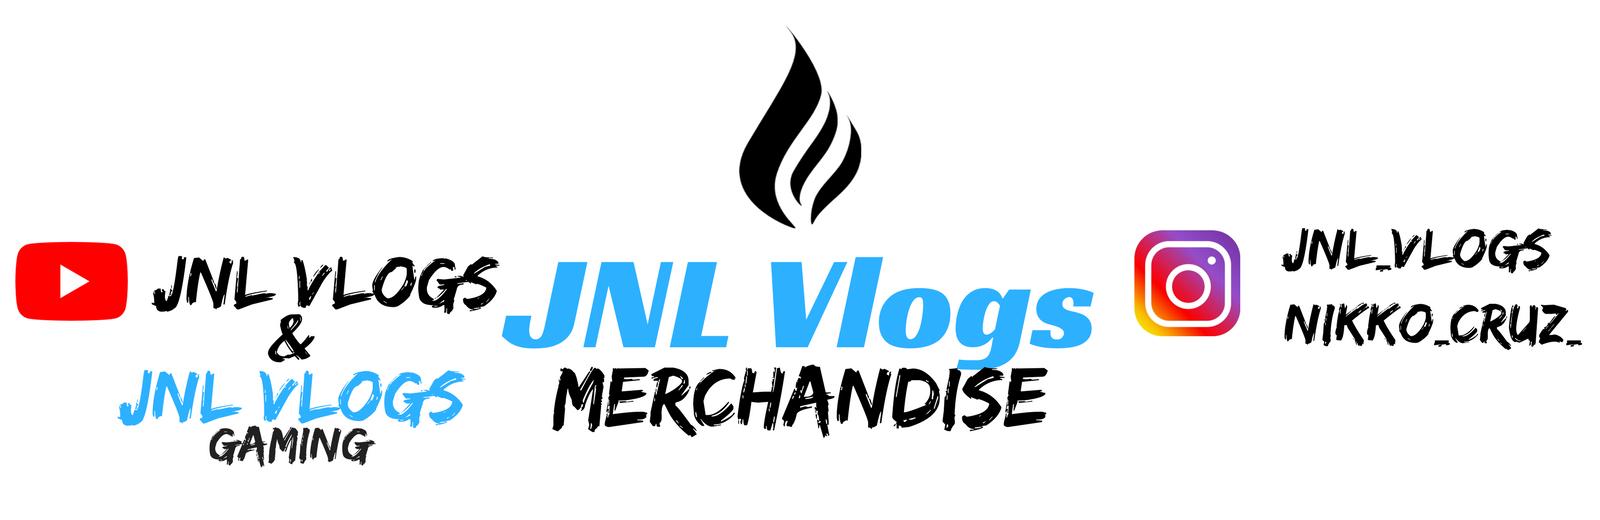 JNL Vlogs Merchandise Store